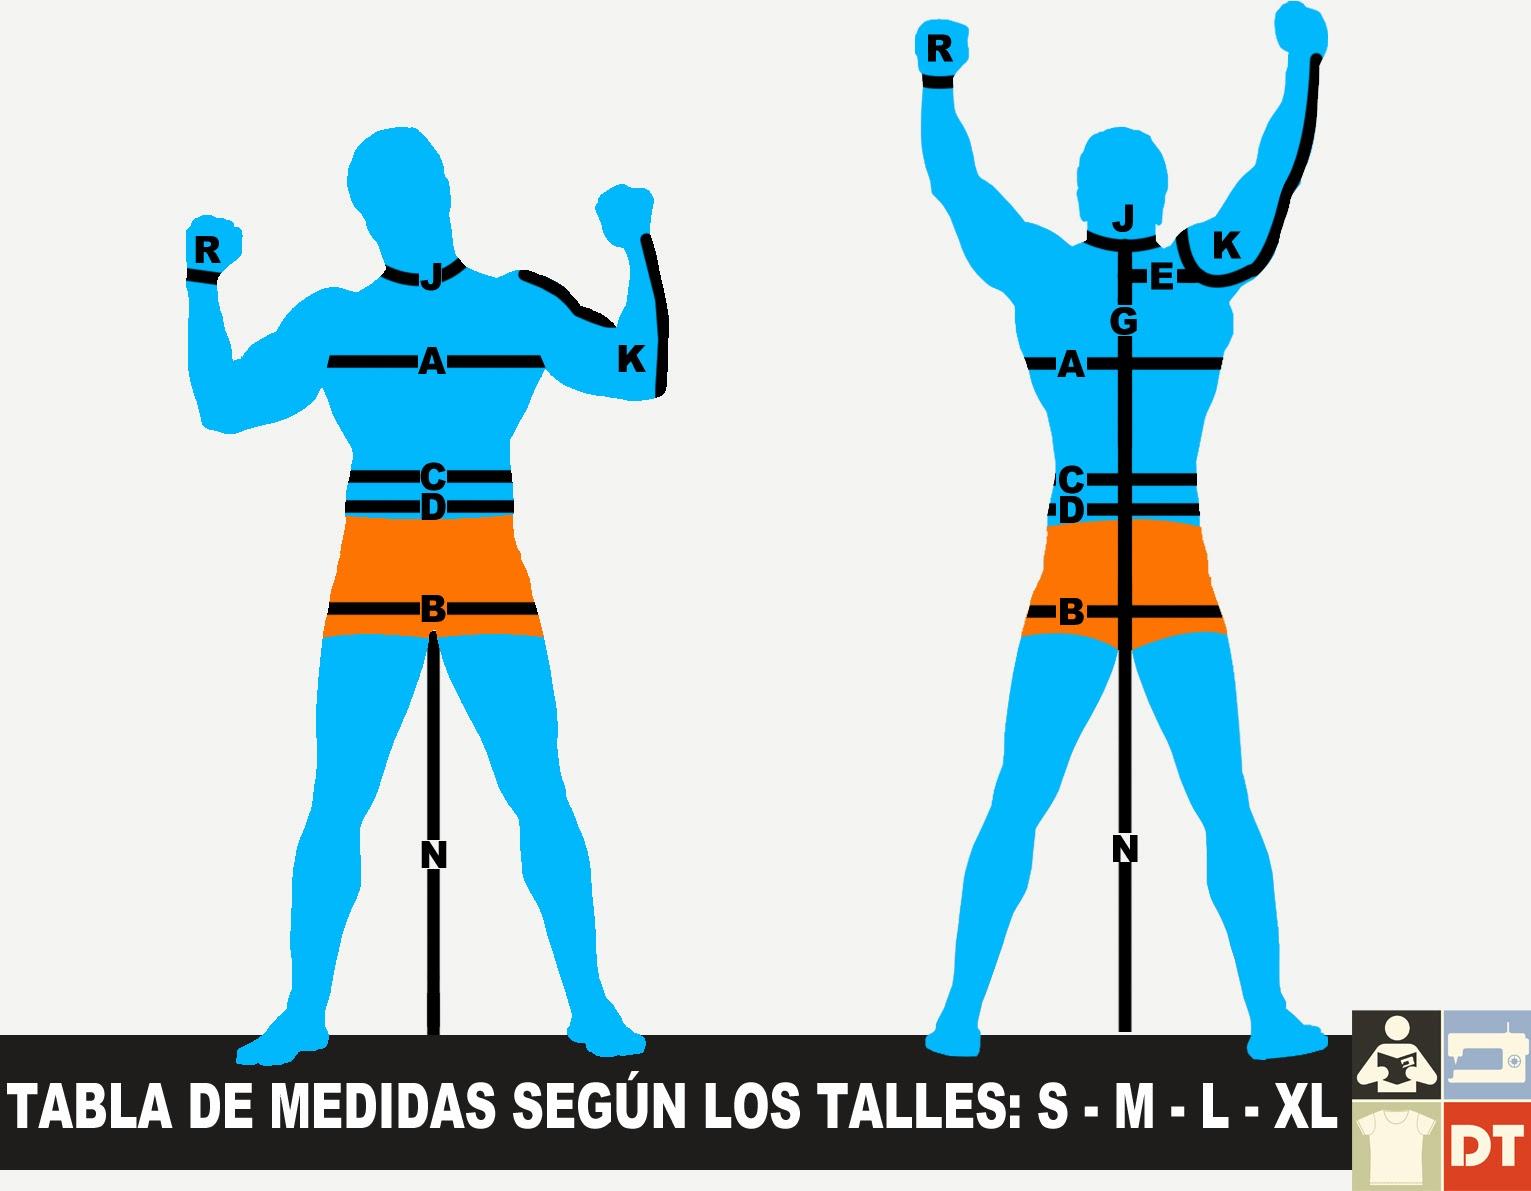 Tabla de medidas: Hombre S - M - L - XL - Coser es fácil